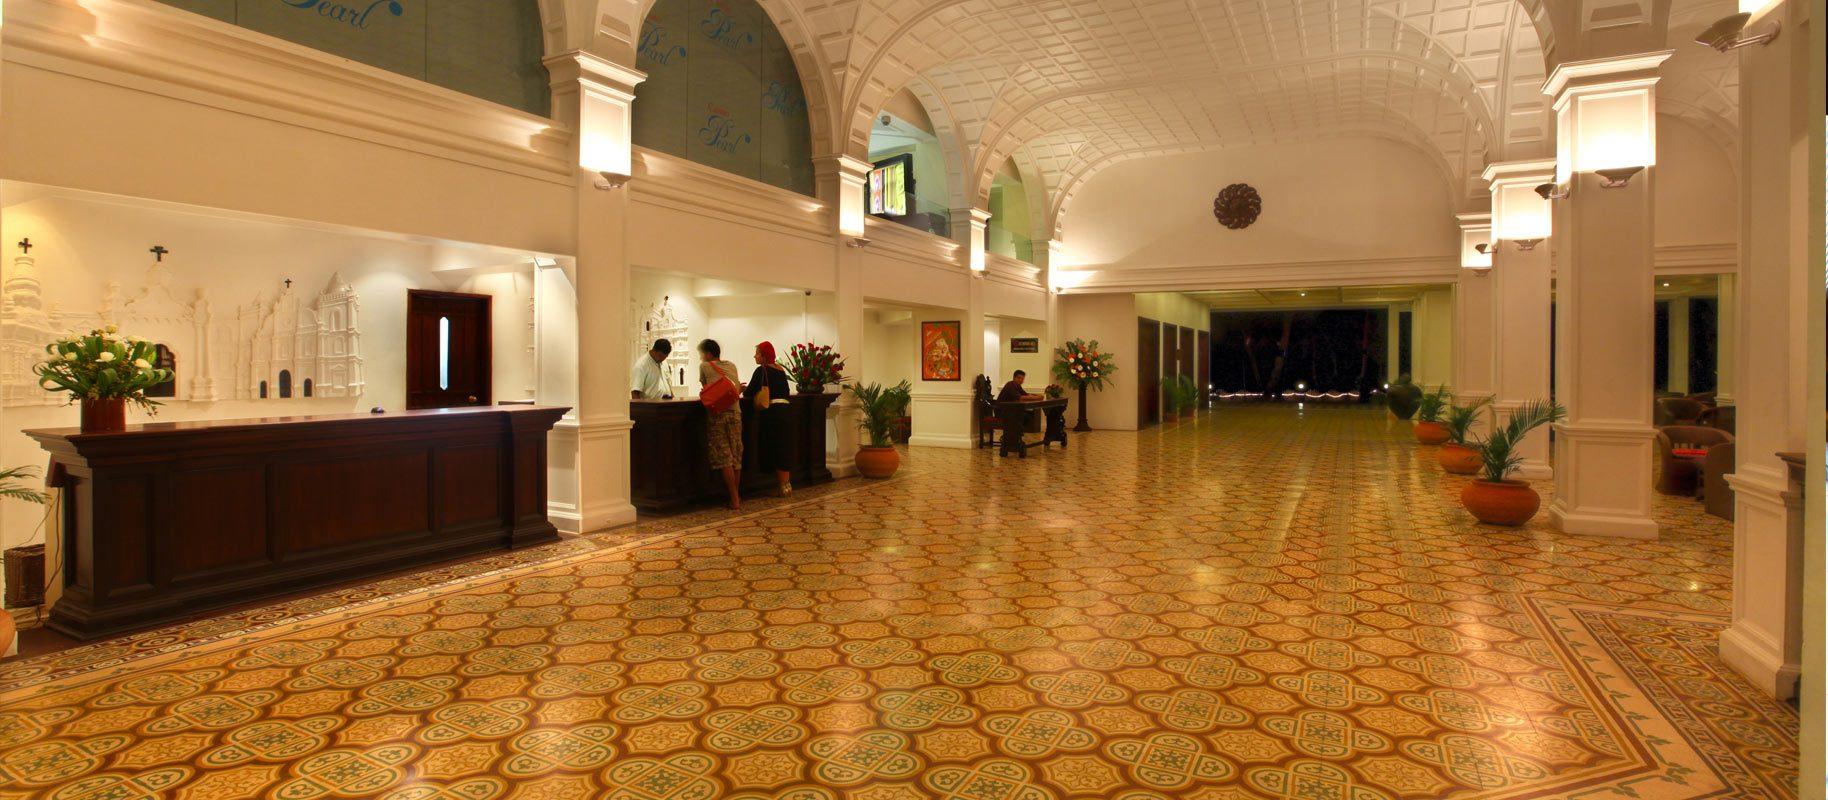 5 Star Resort in Goa.